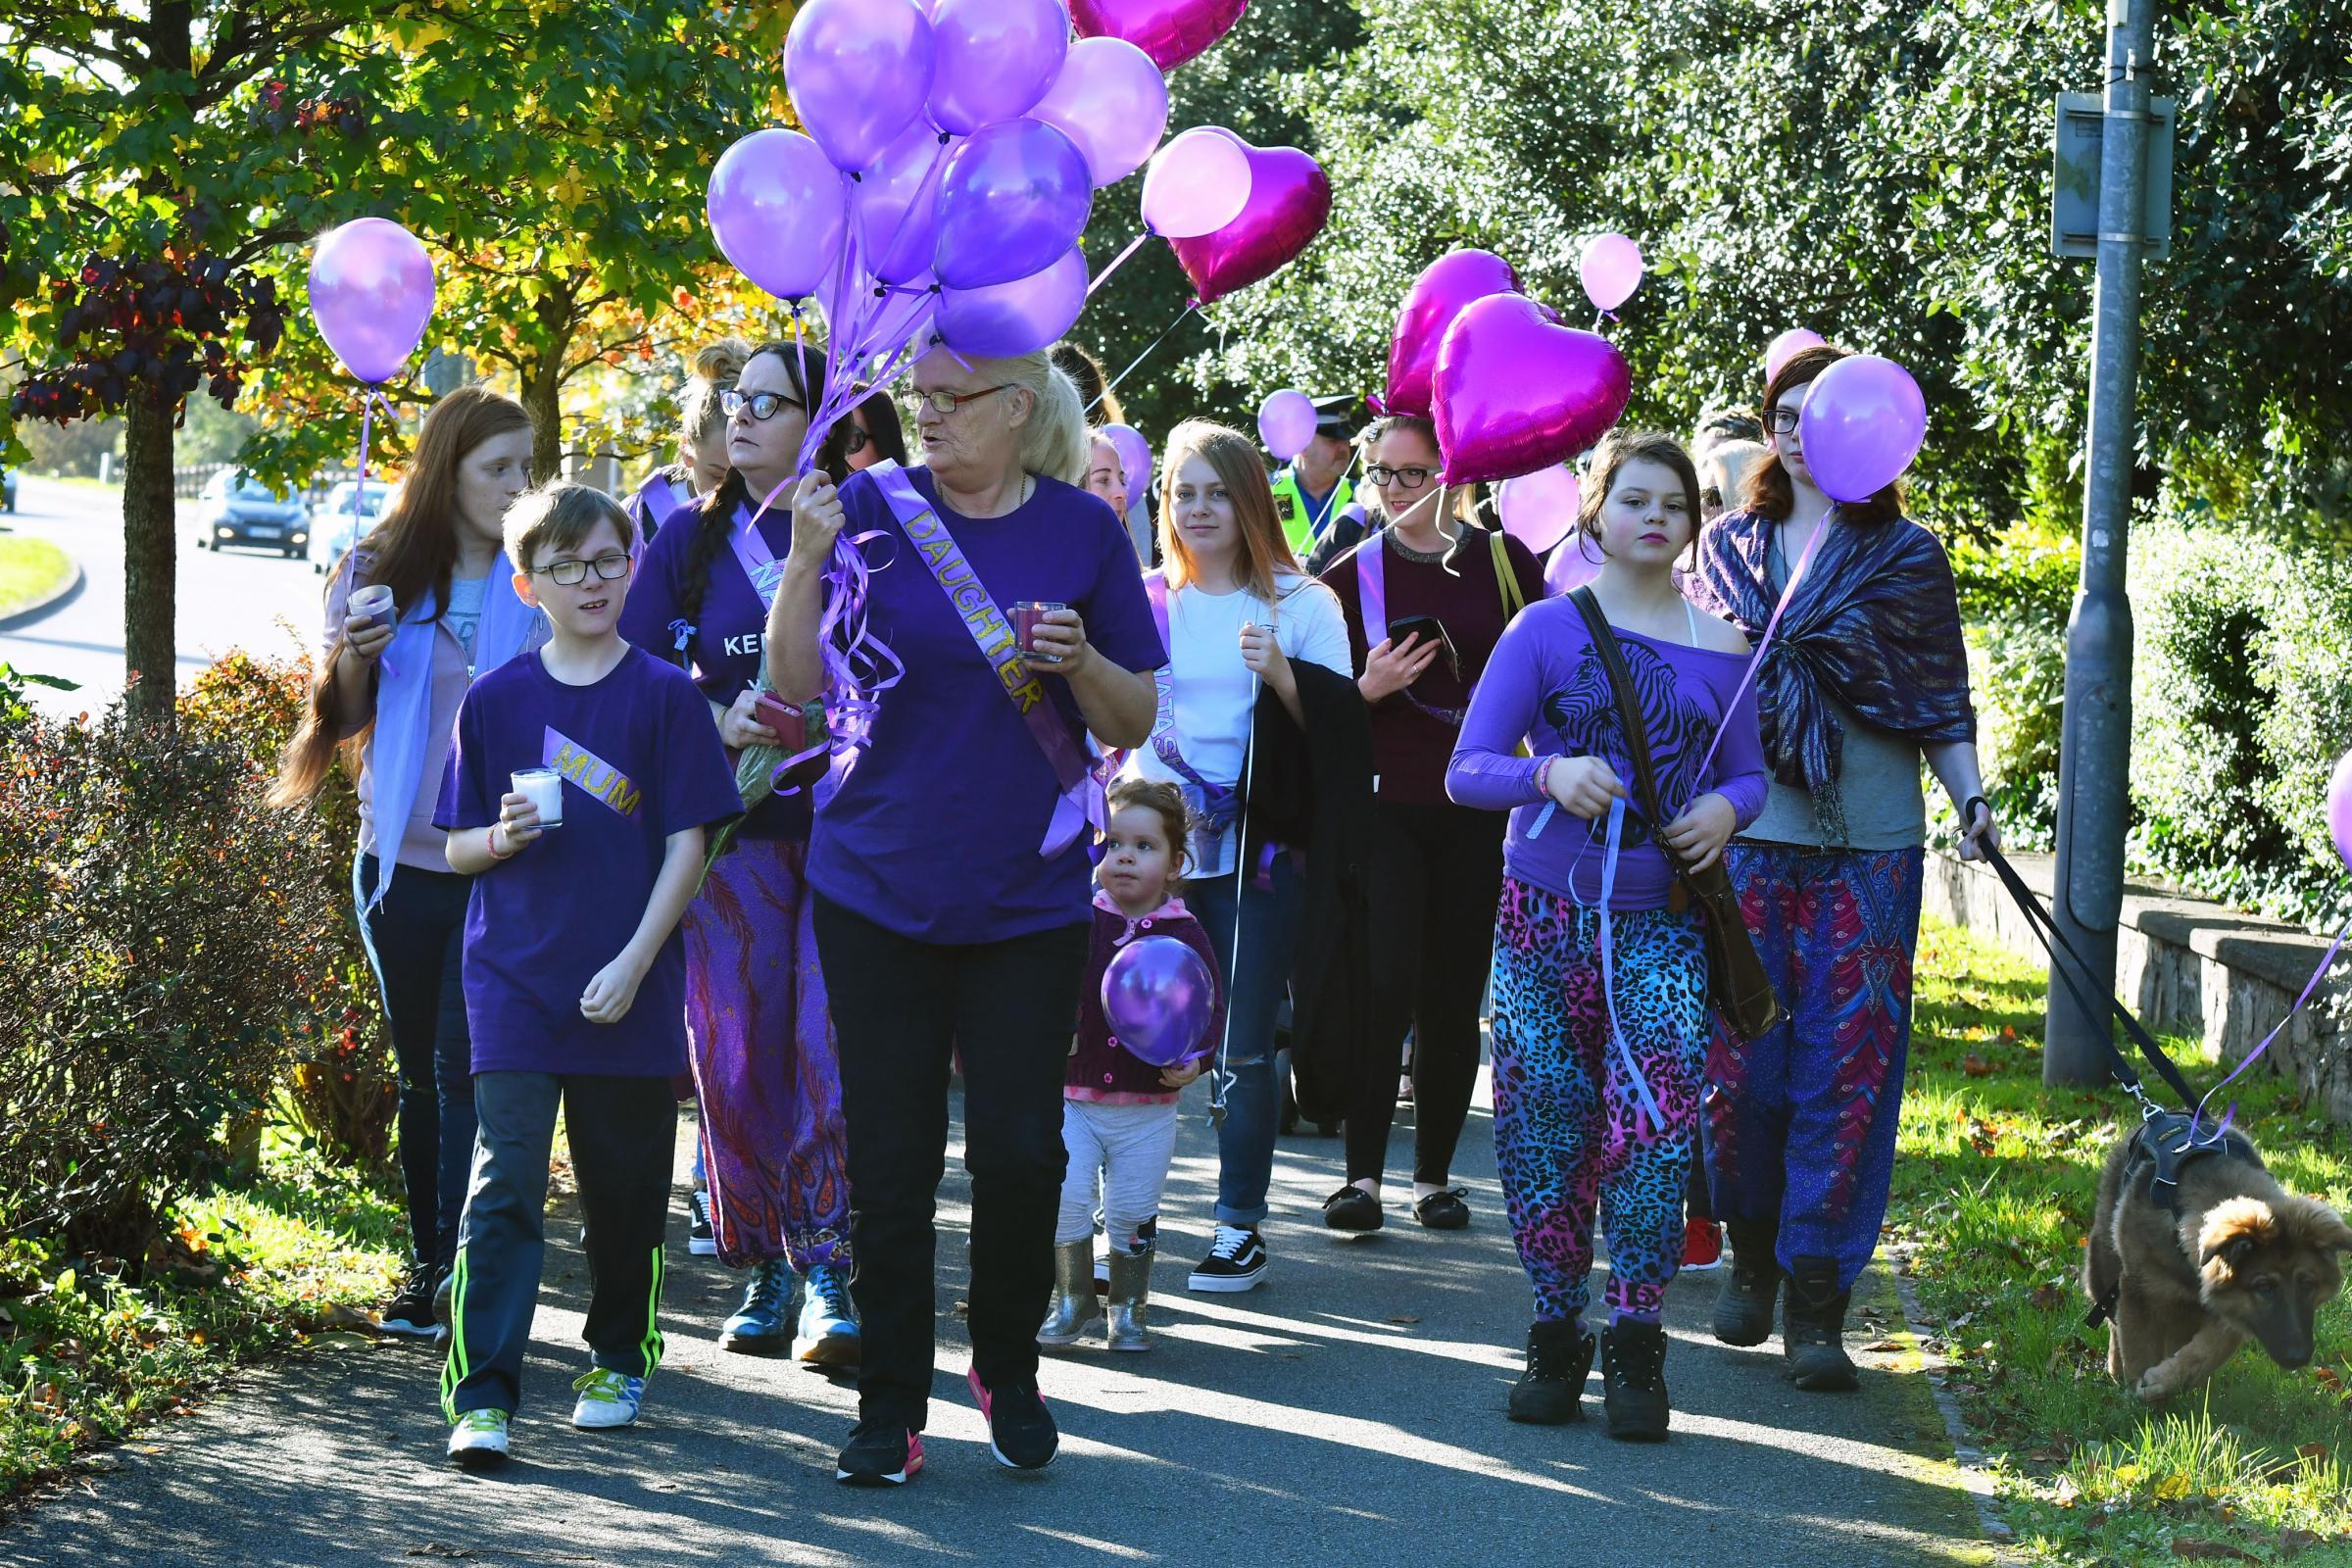 Haverfordwest High Street a sea of purple in memory of murder victim Natasha Bradbury